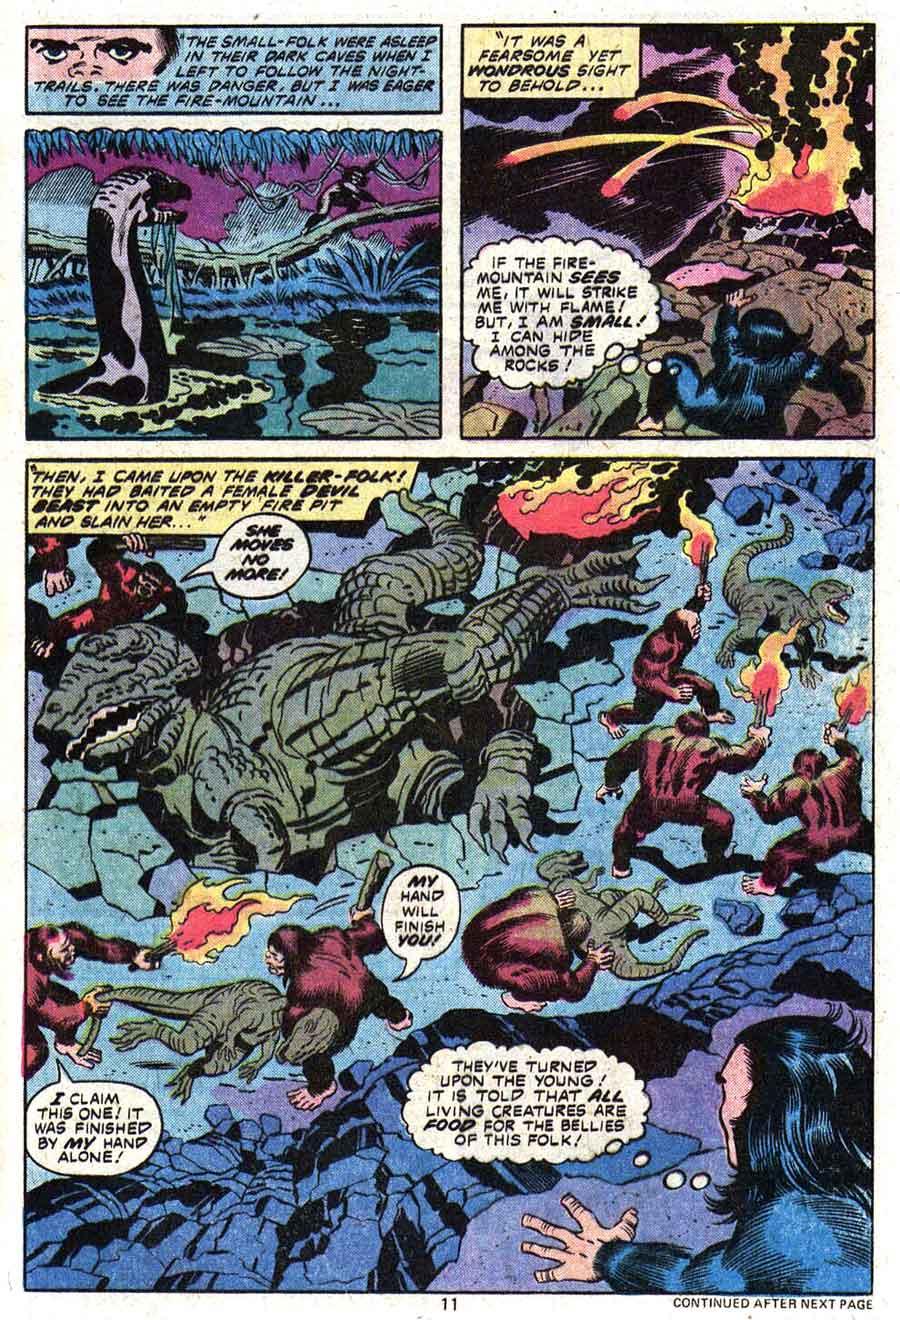 Devil Dinosaur #1 marvel 1970s bronze age comic book page art by Jack Kirby